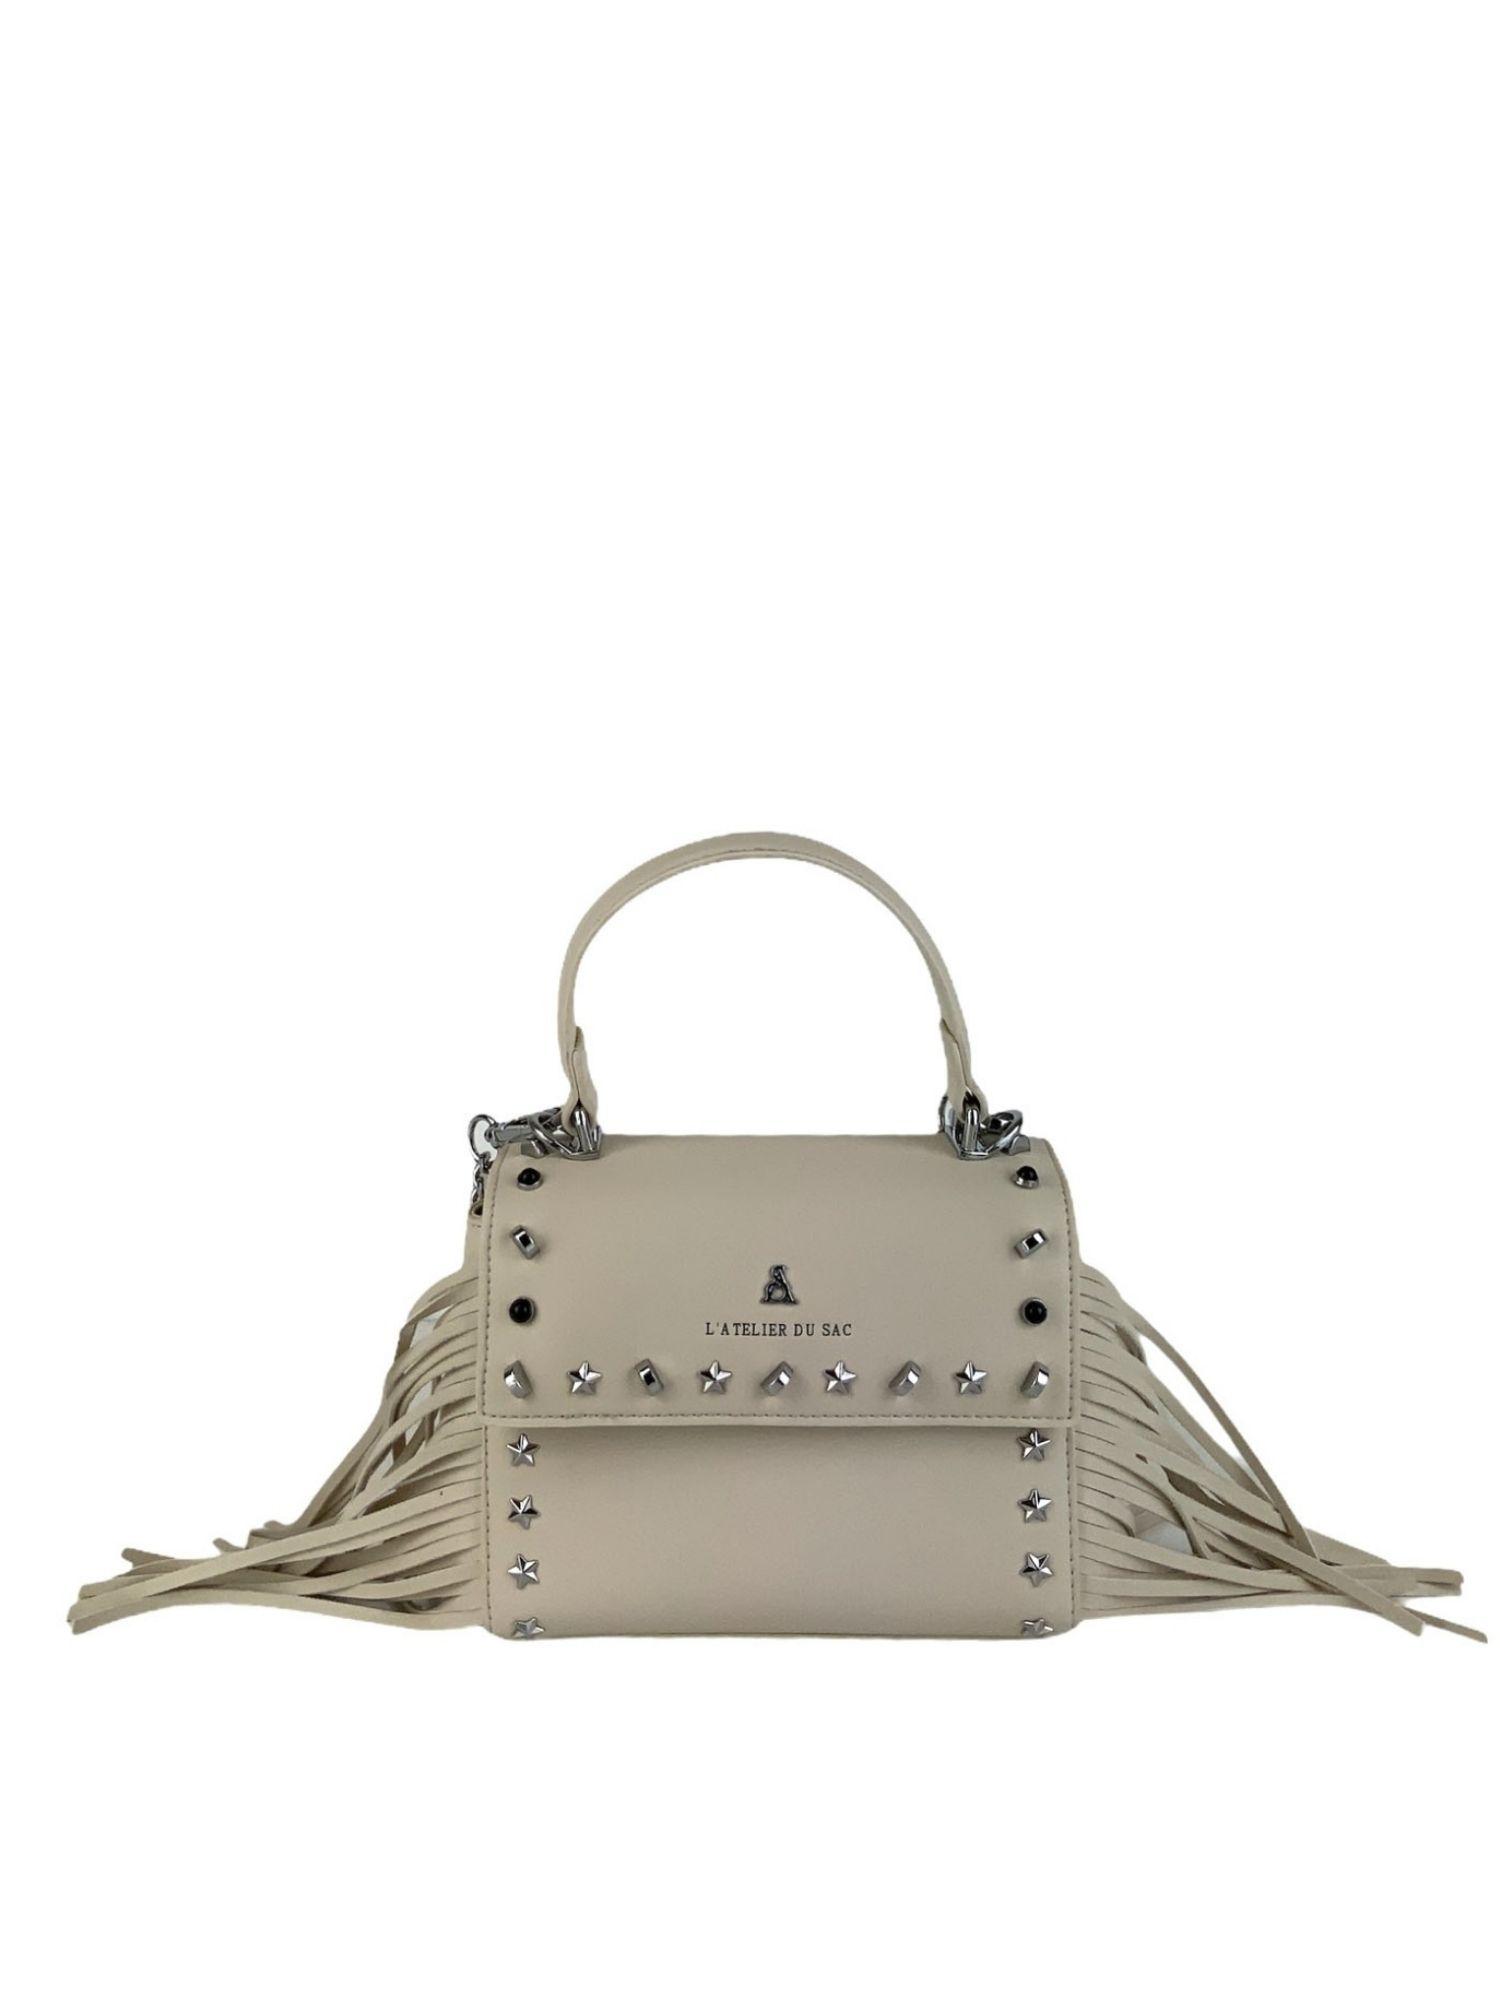 Borsa Pash Bag Atelier Du Sac 10907 Avorio